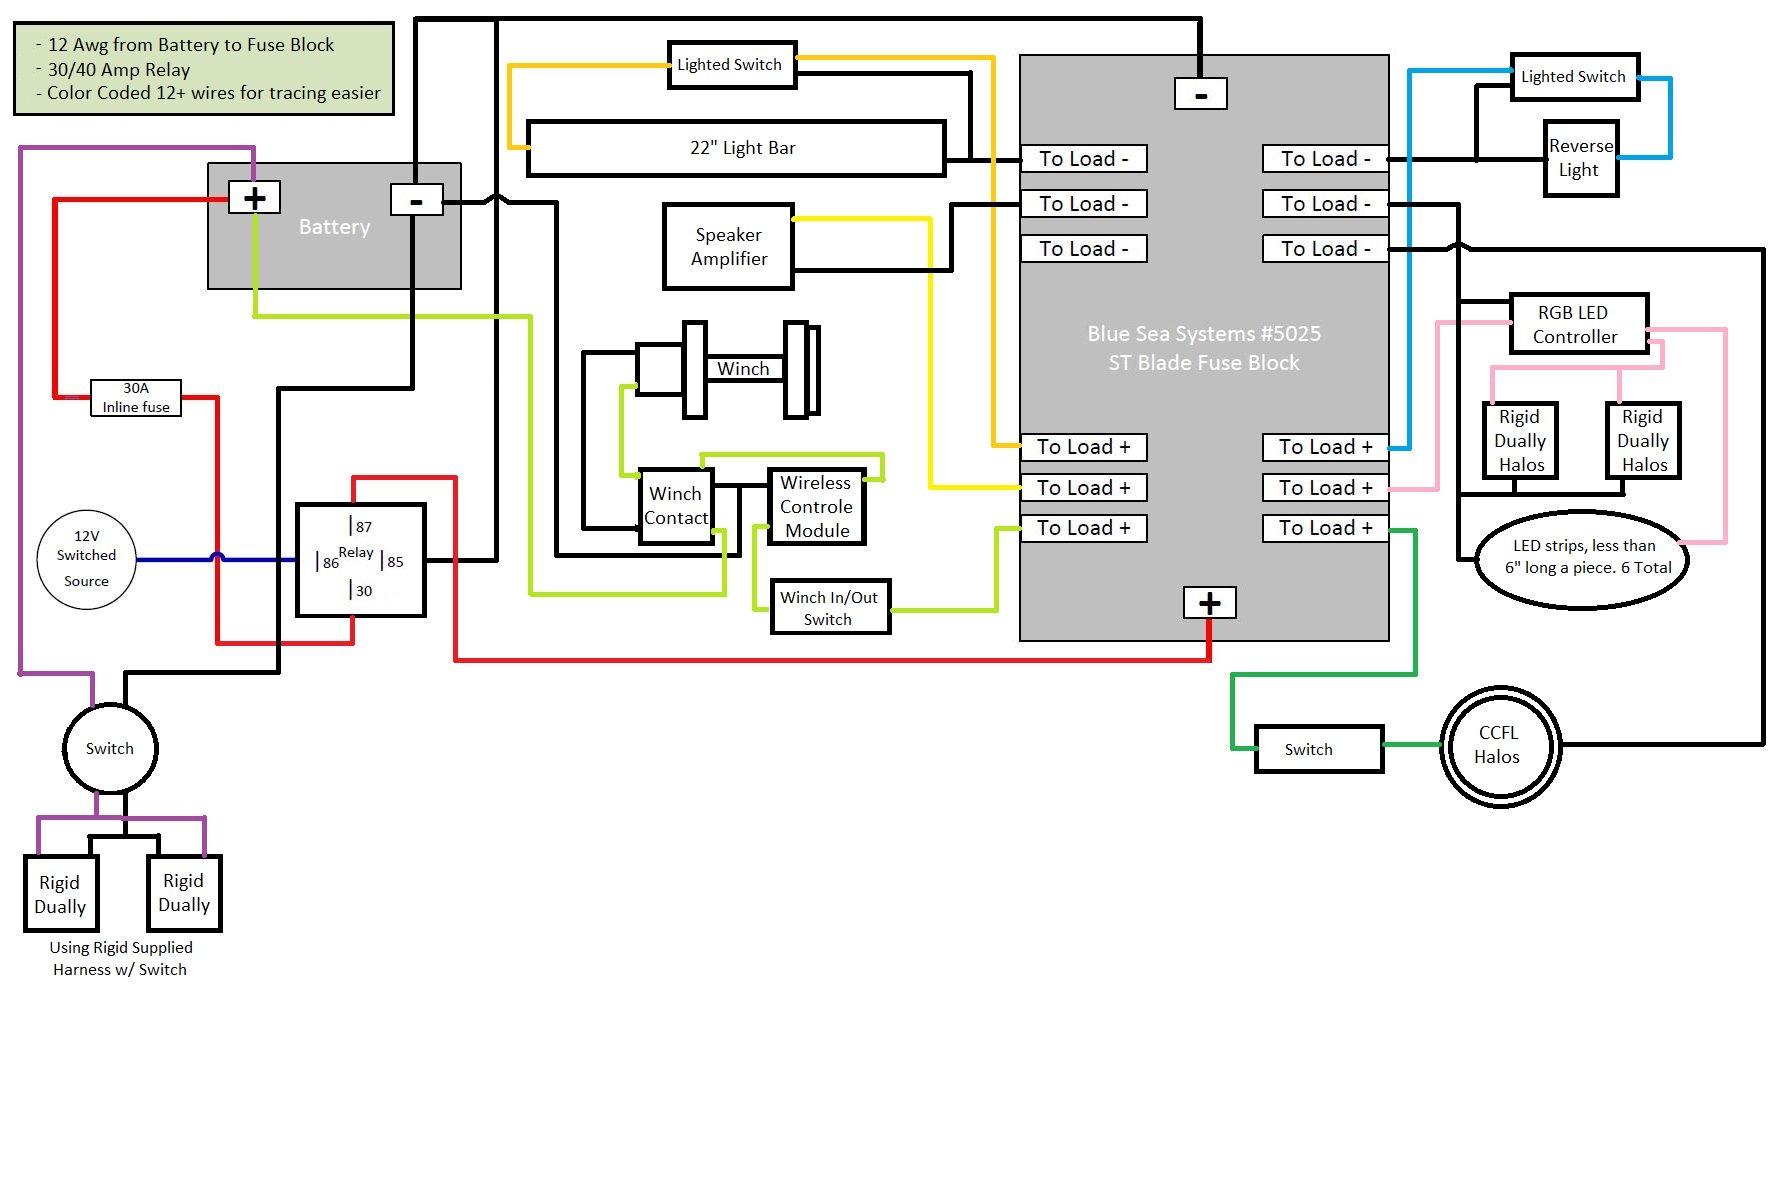 2010 Yamaha Nytro Wiring Diagram 1989 Ford F 250 Ignition Wiring Diagram Pipiiing Layout Tukune Jeanjaures37 Fr